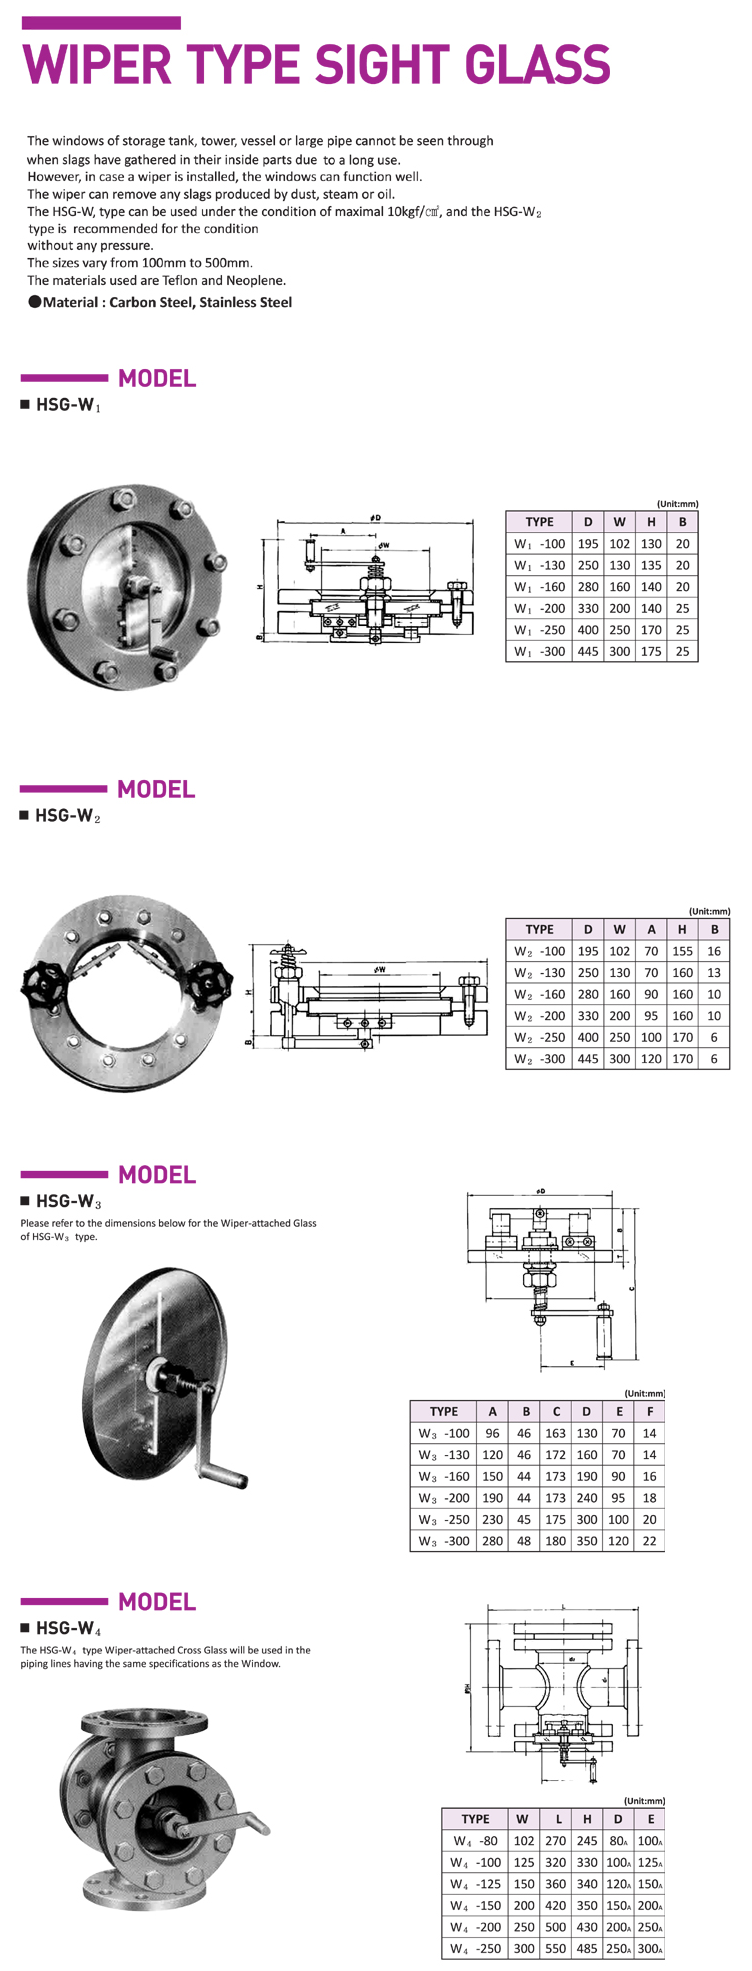 HITELFI Wiper Type HSG-W Series